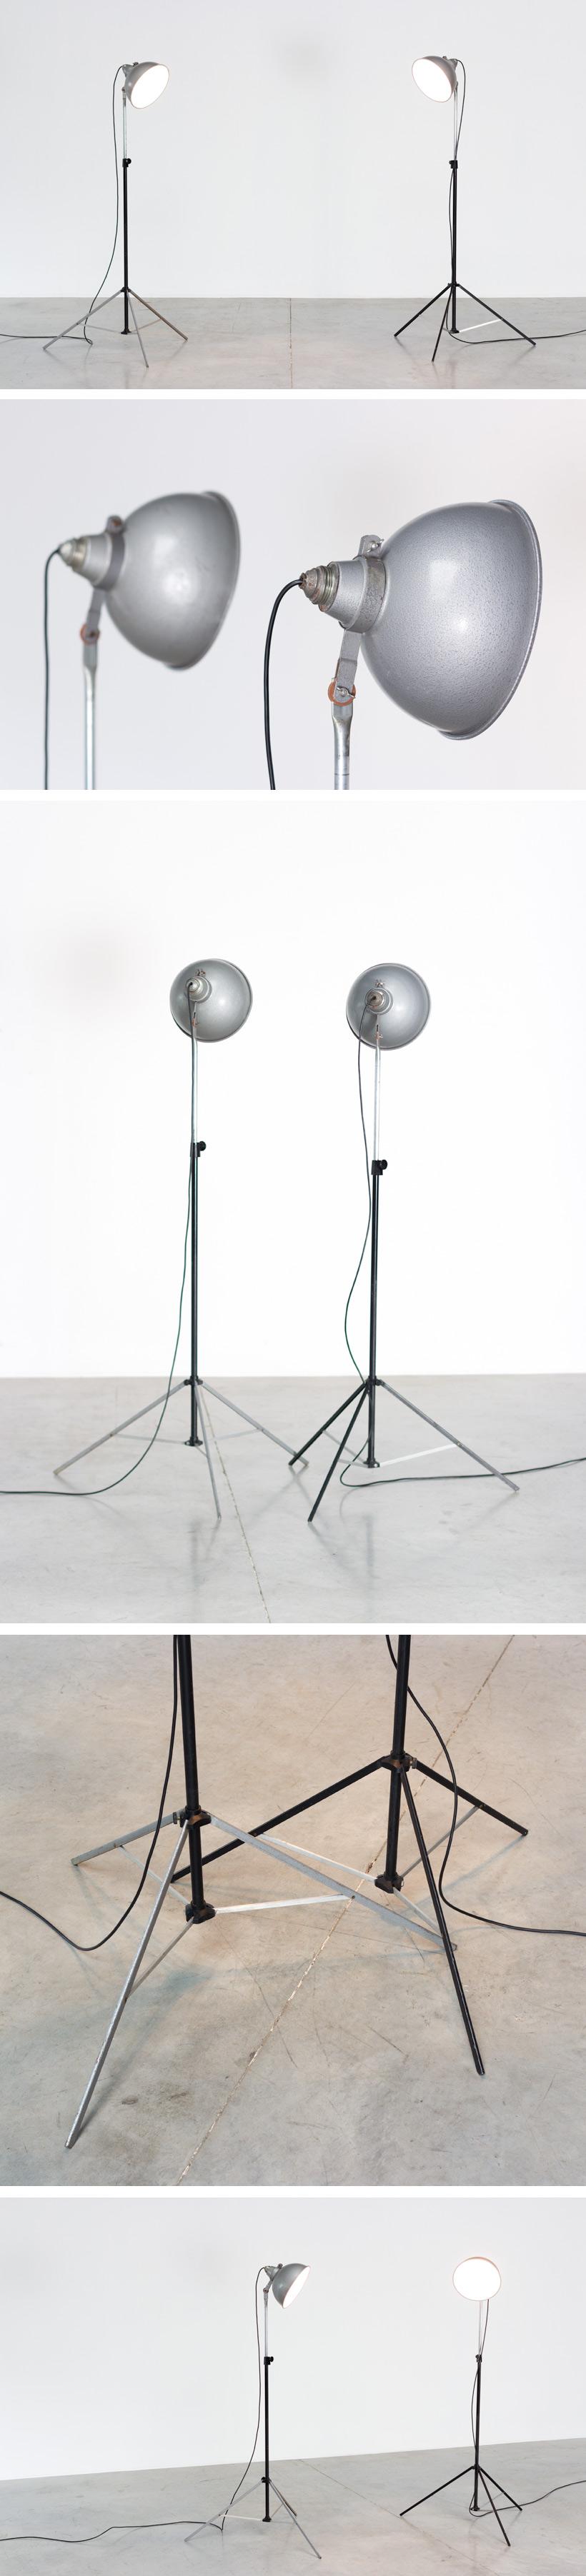 Narita pair industrial photographic studio lamps Large